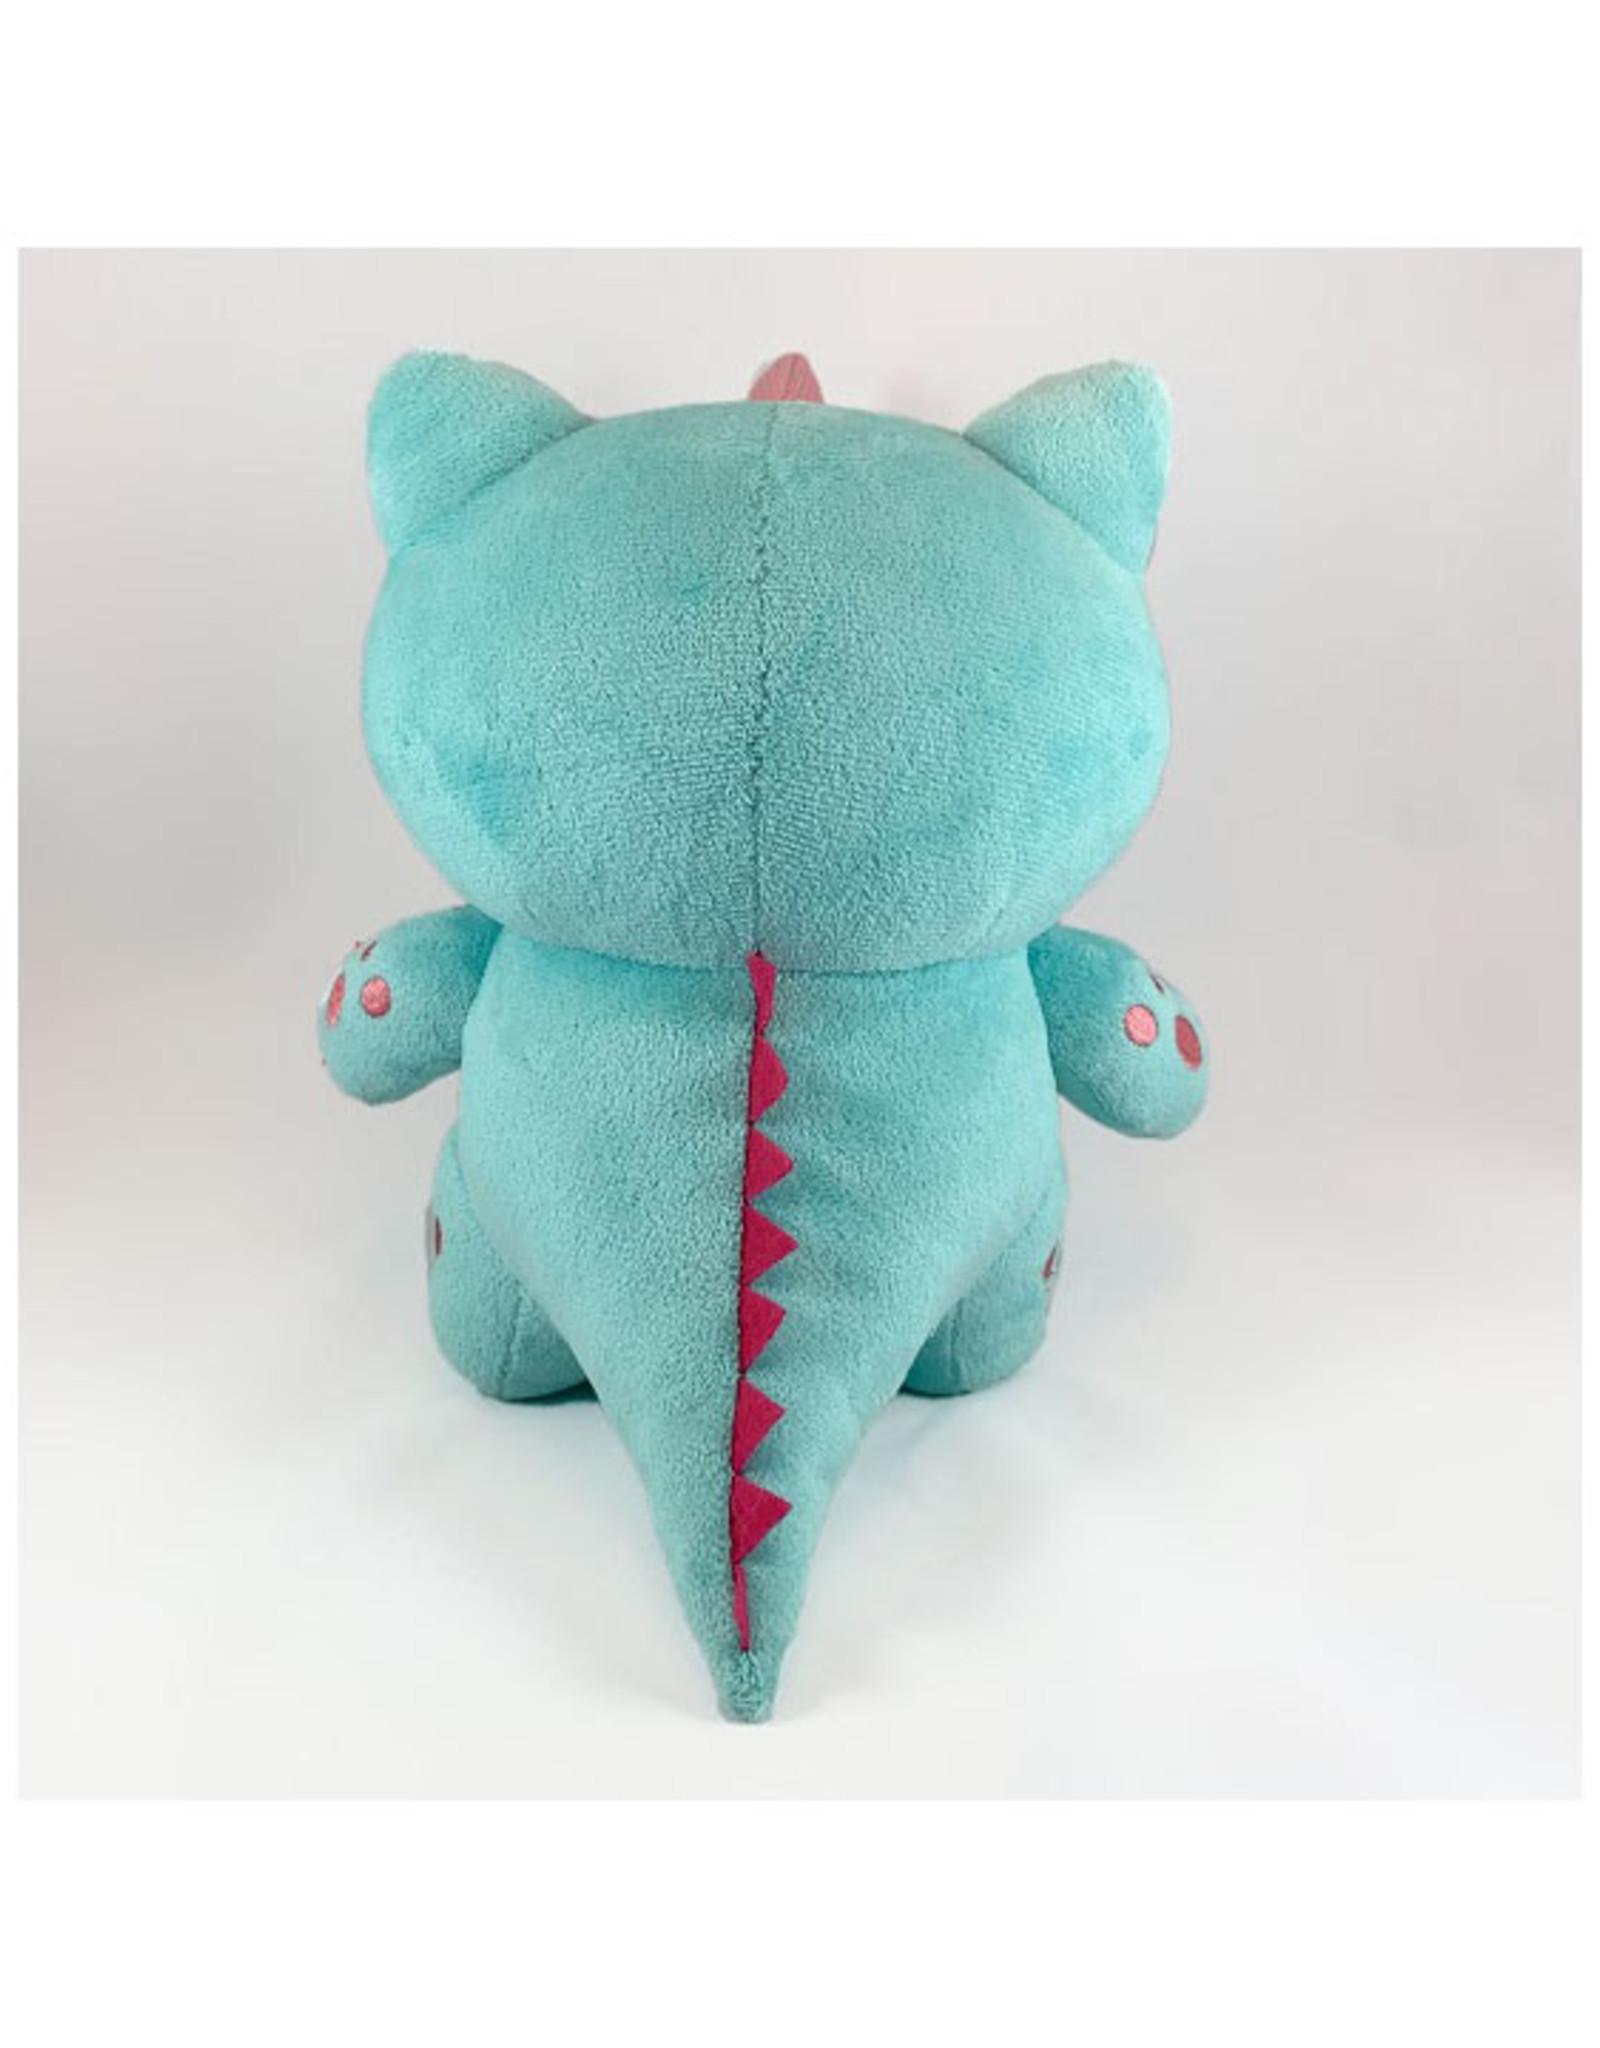 Chubbo Kaiju Kitty Plush